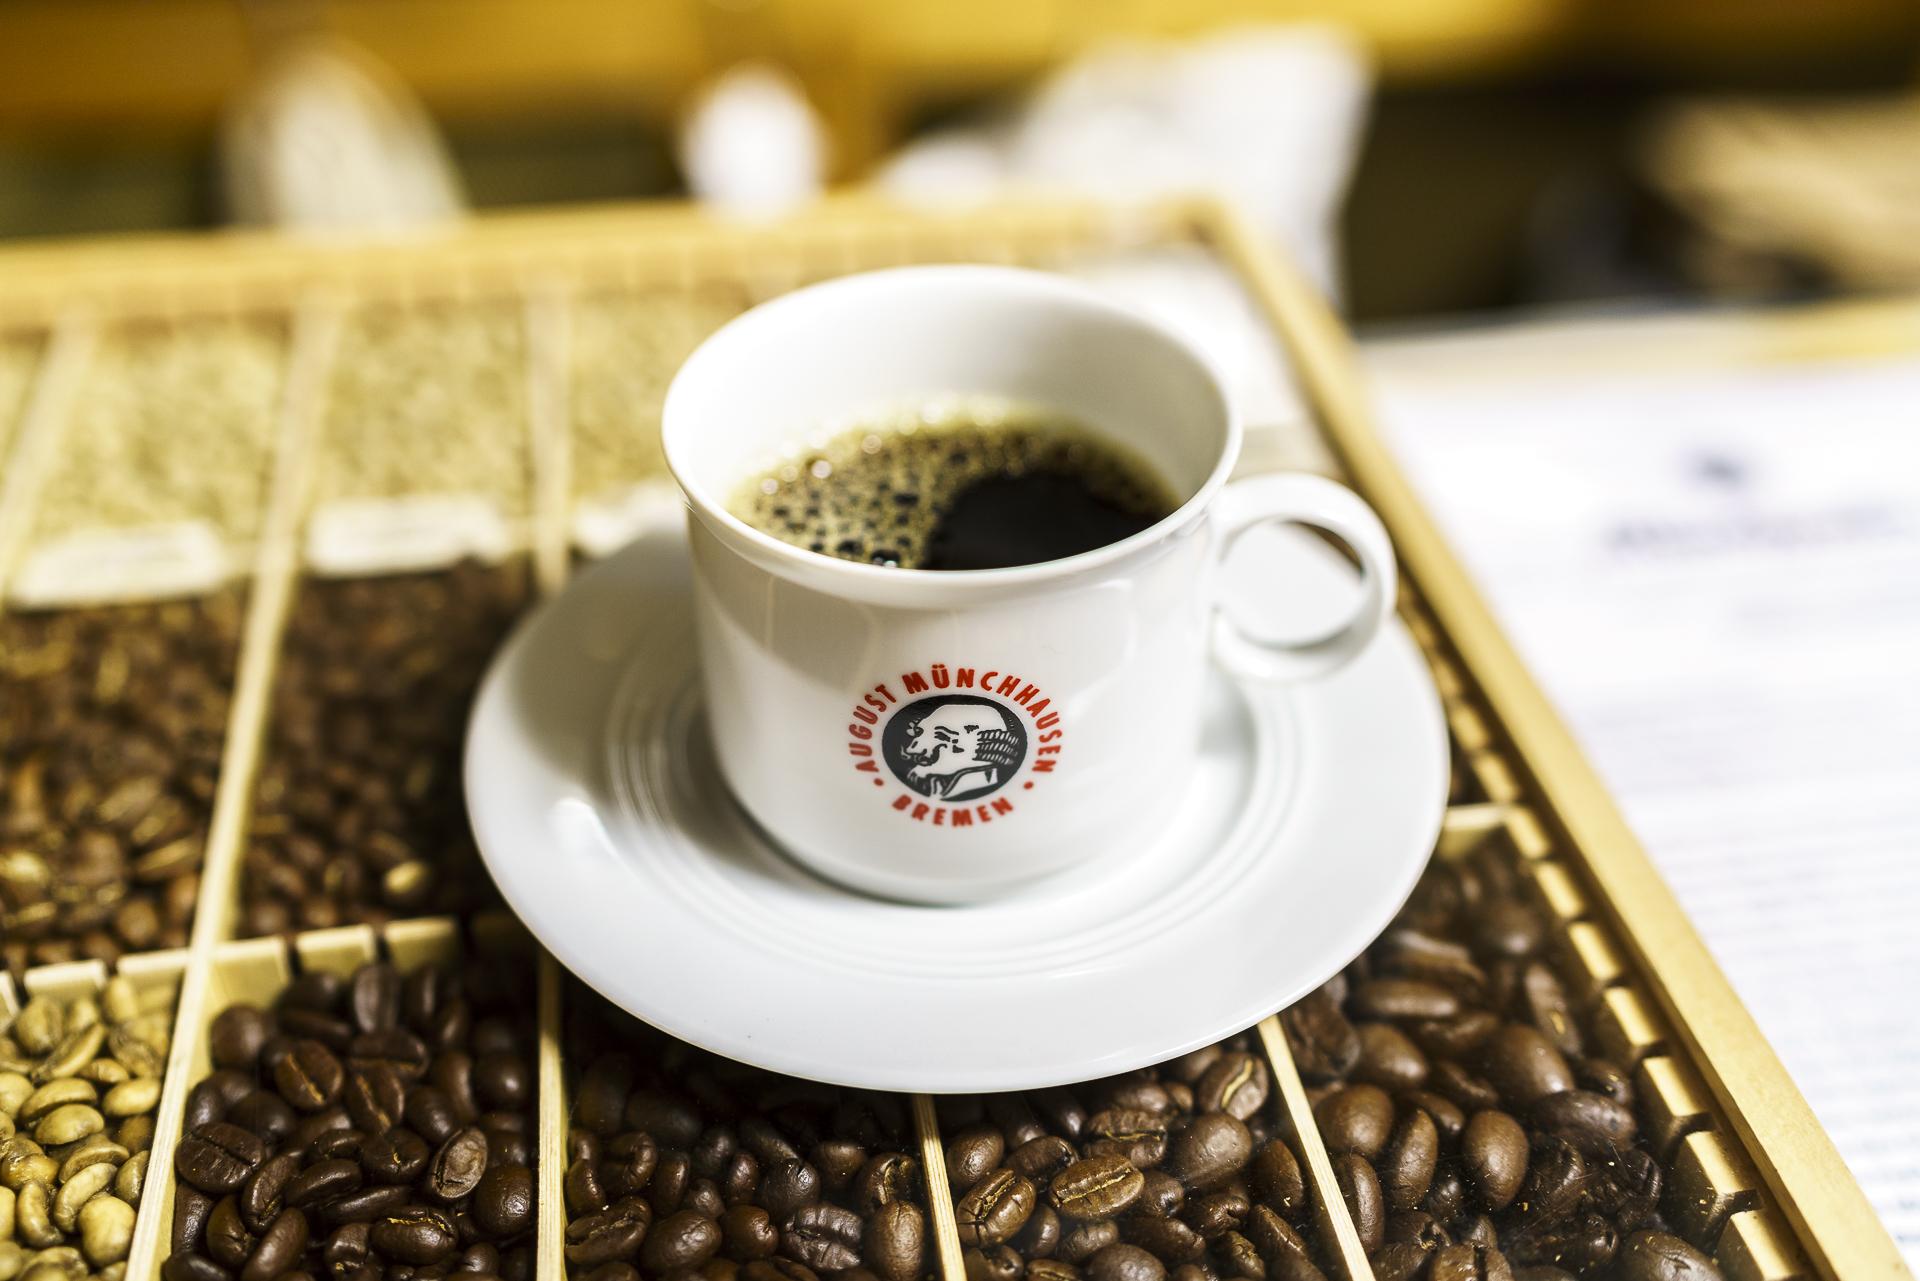 muenchhausen-kaffee-bremen